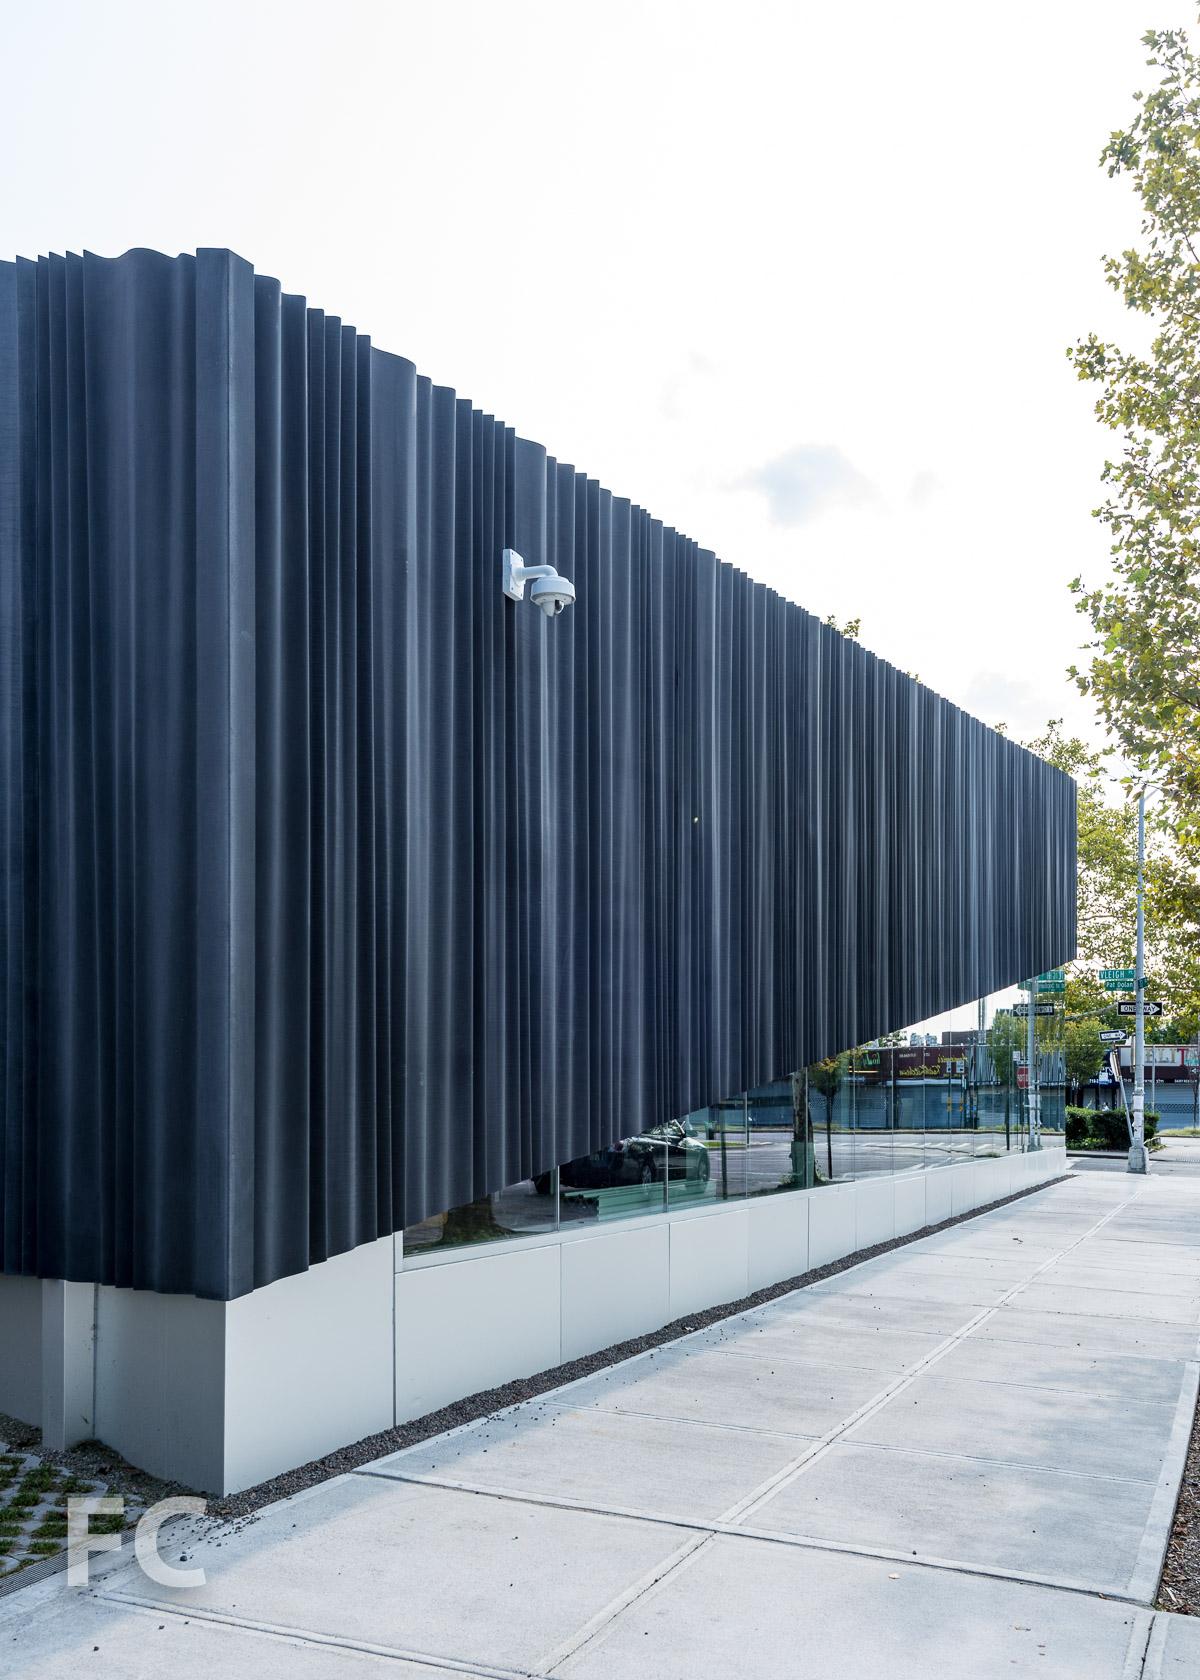 North façade.